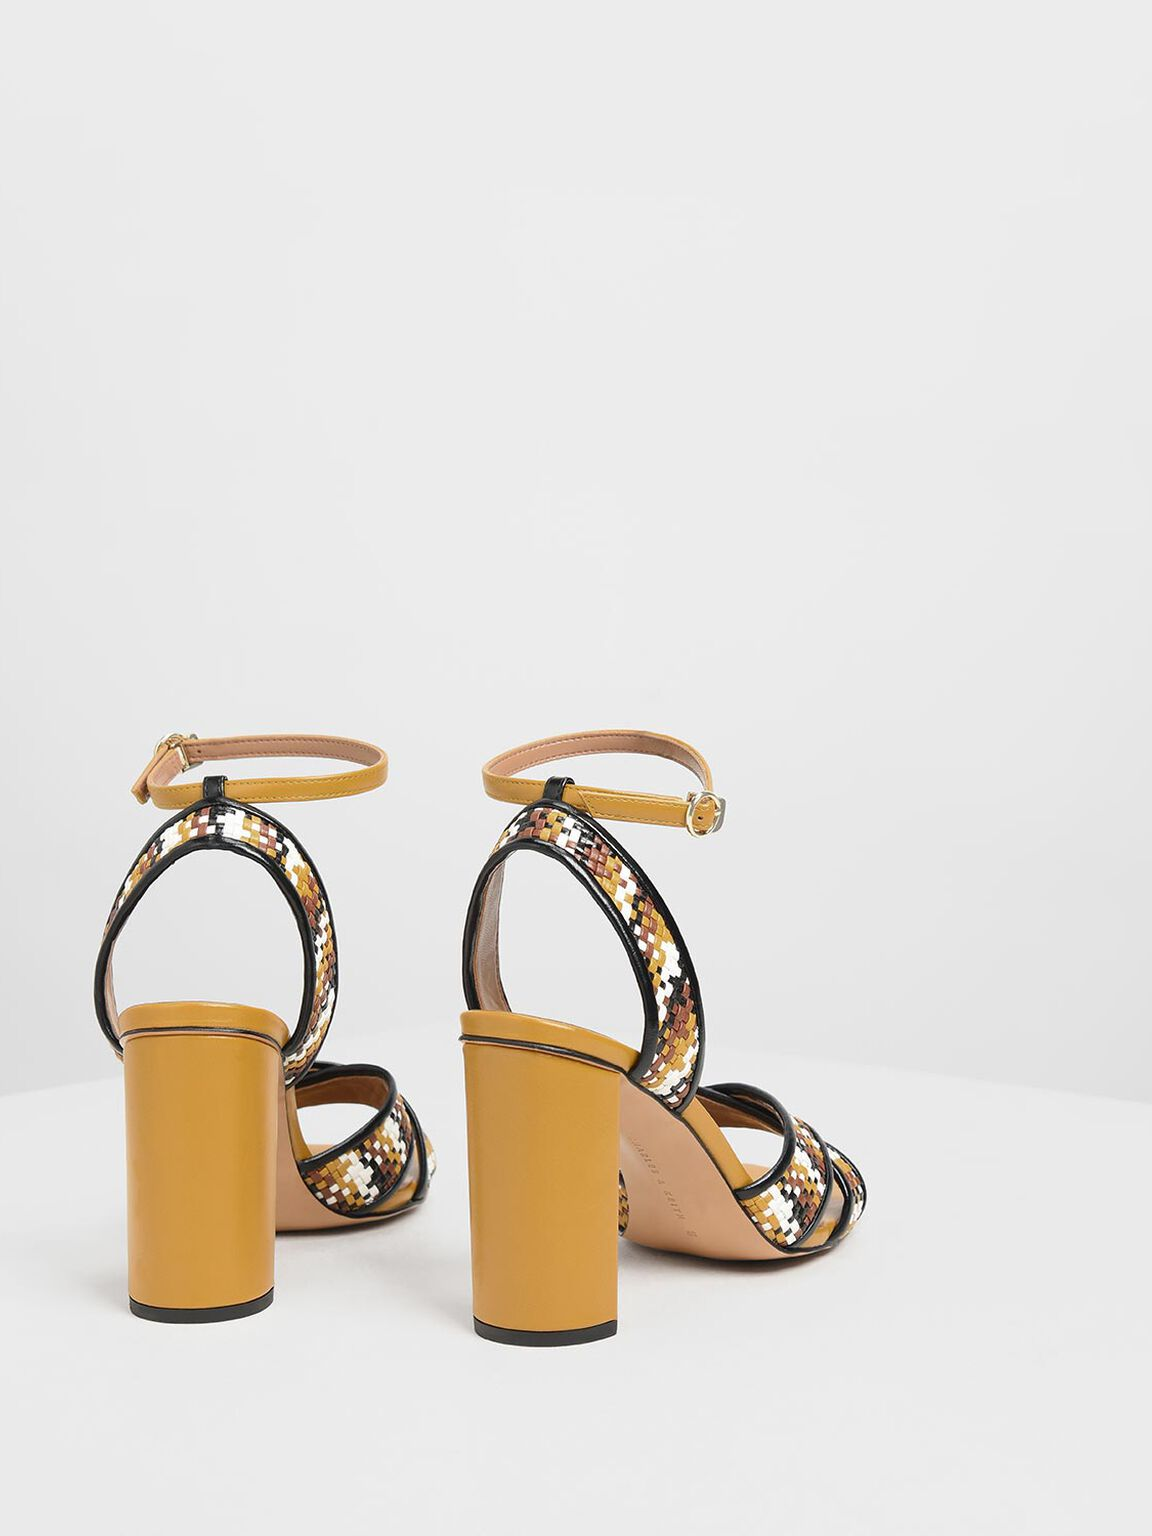 Woven Raffia Two-Tone Sandals, Brown, hi-res